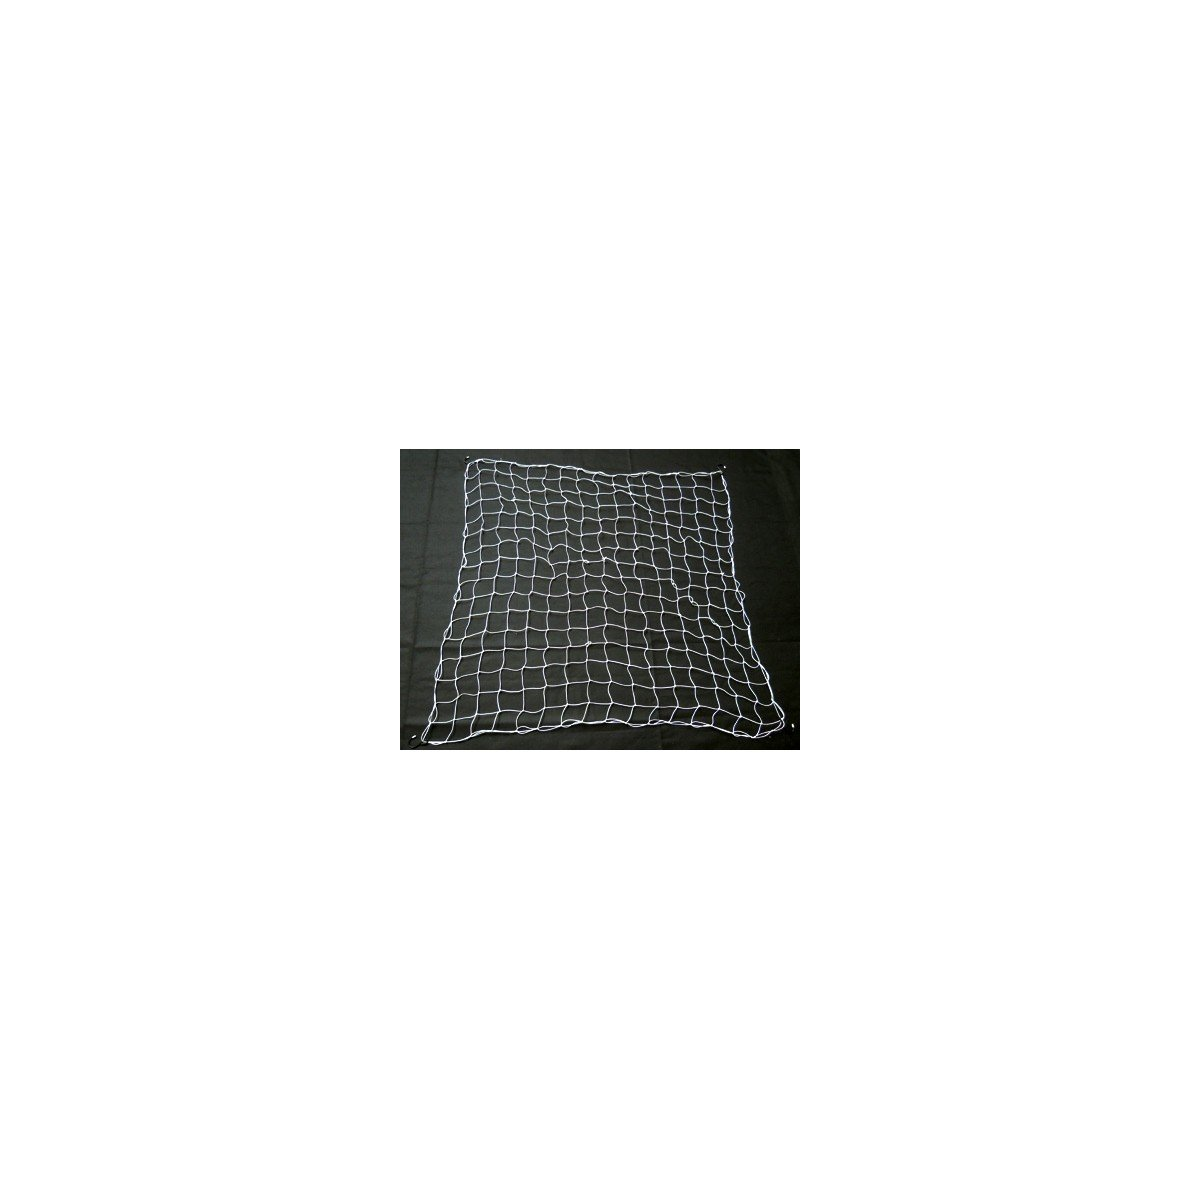 Elastic mesh SCROG / Net support Secret Jardin WebIT 150 (150x150cm) FLORATECK